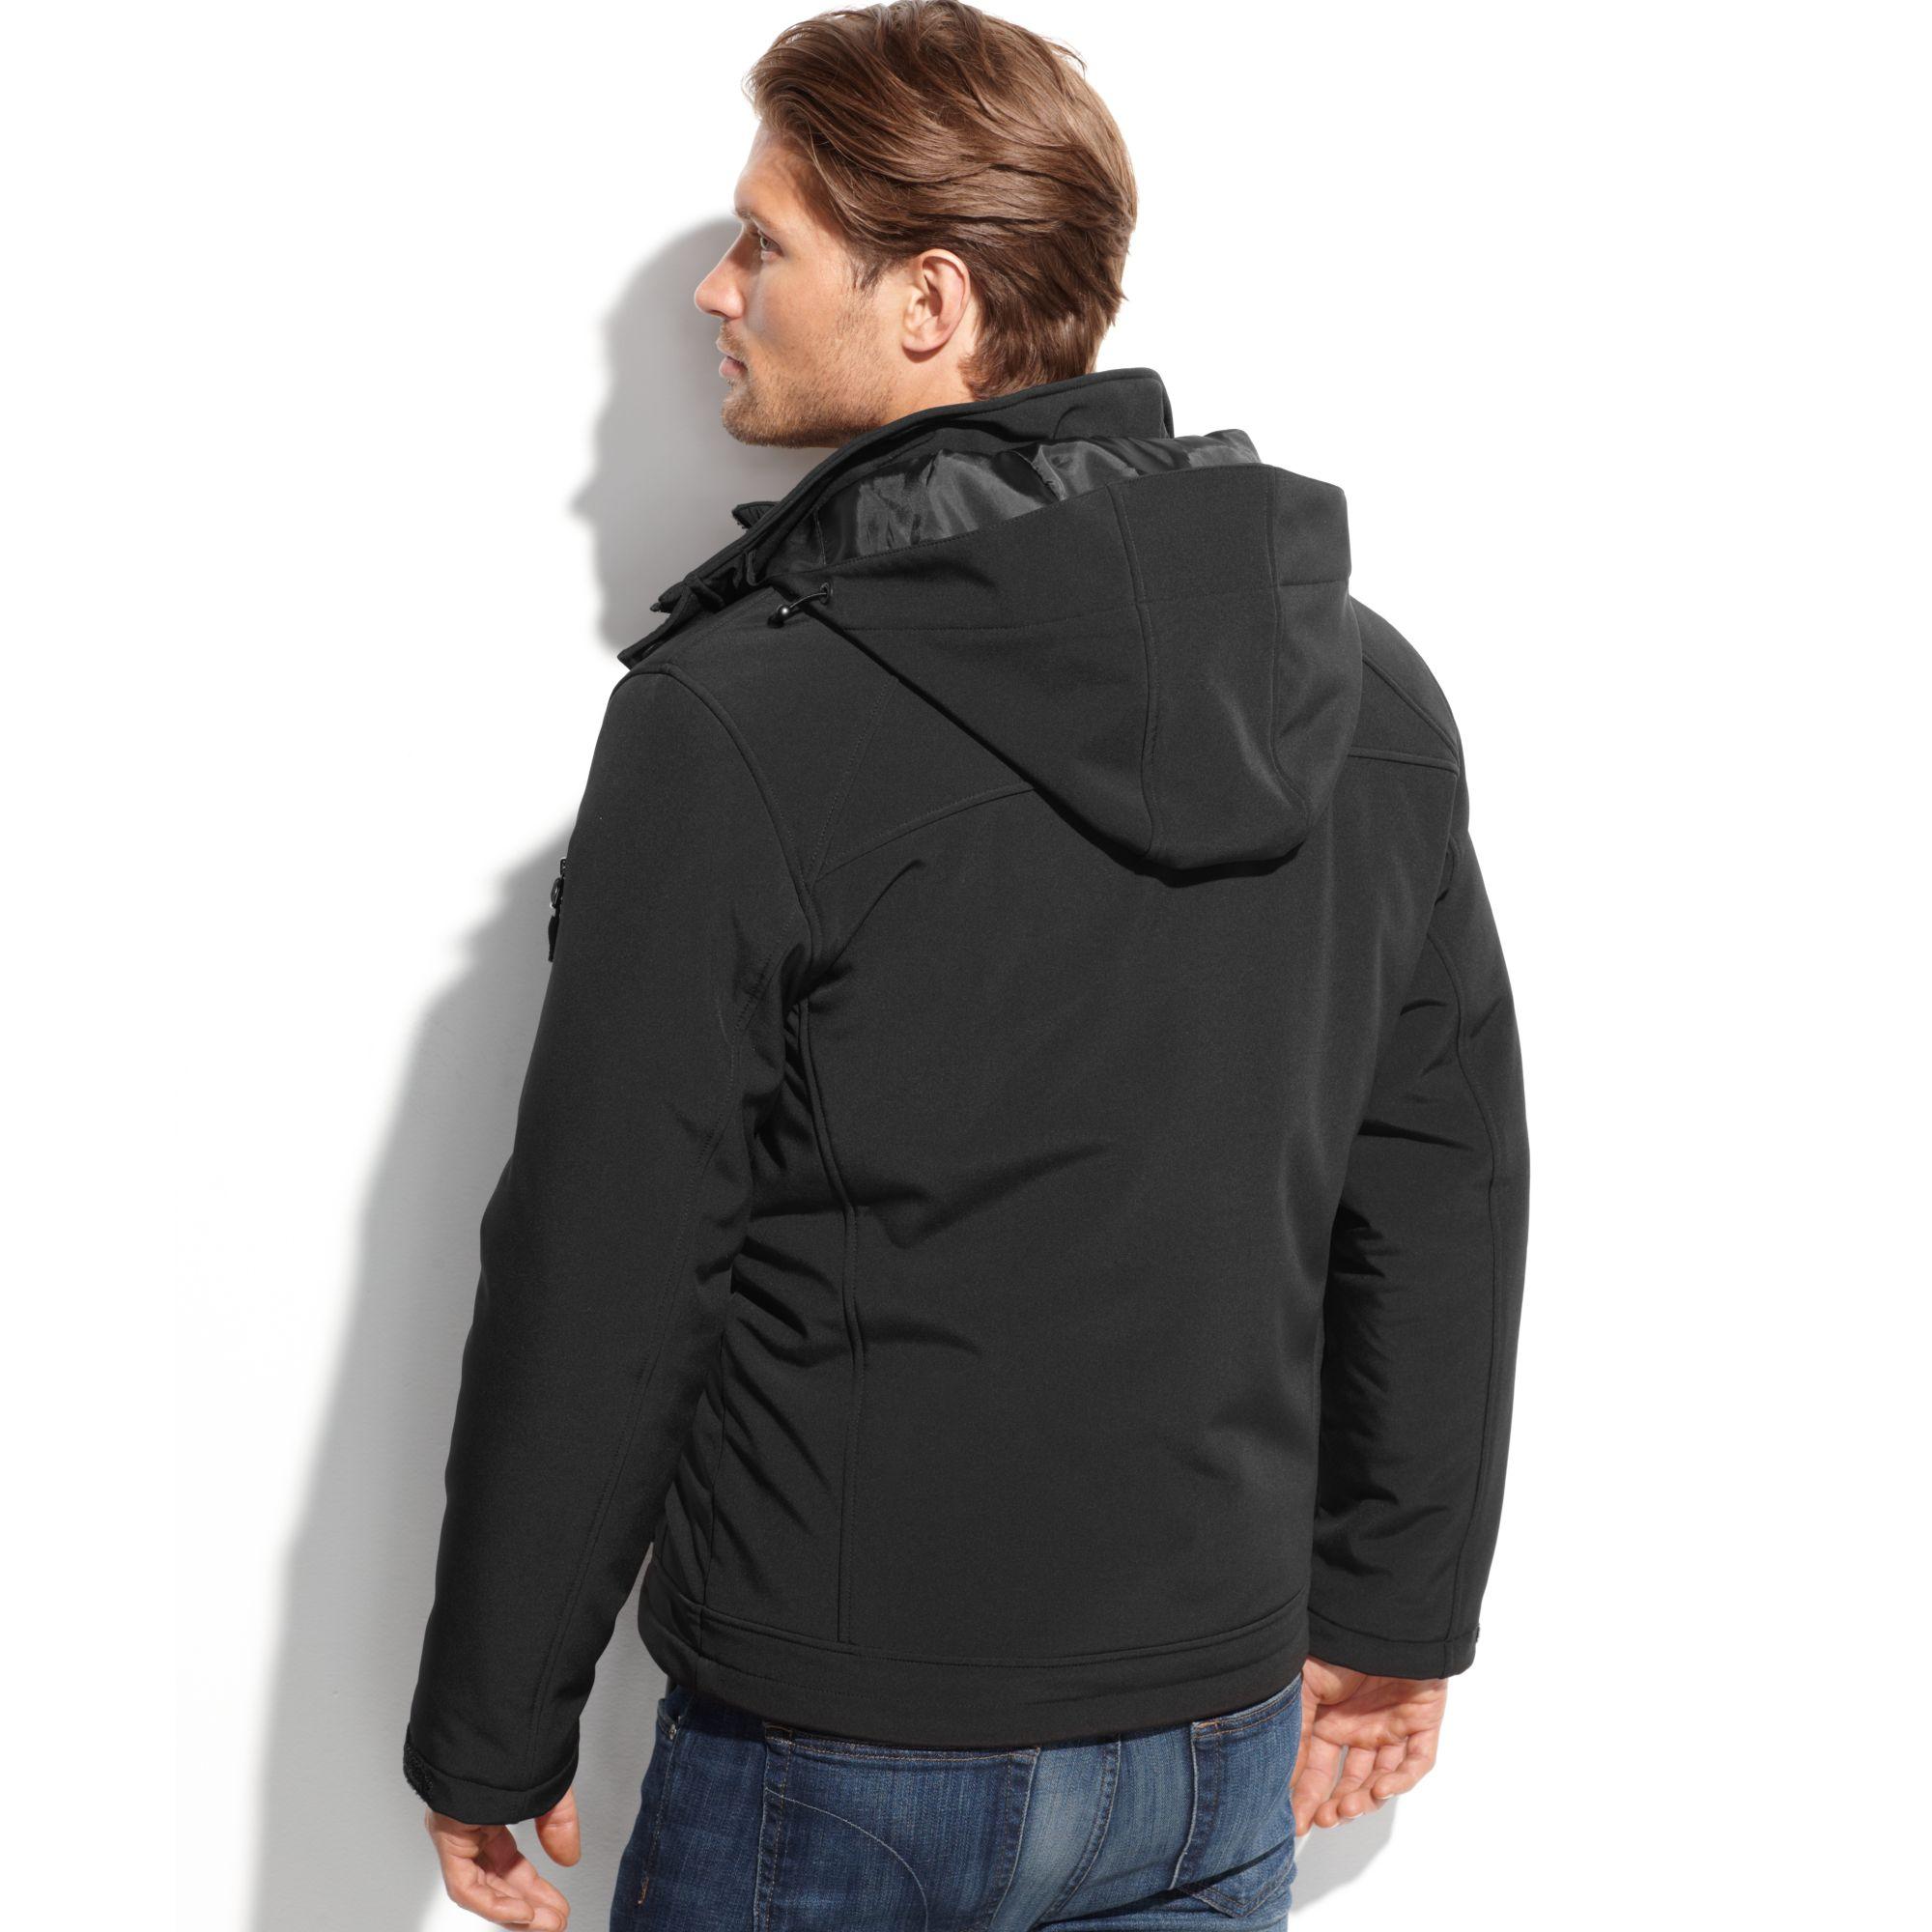 lyst calvin klein 3in1 systems softshell jacket in black. Black Bedroom Furniture Sets. Home Design Ideas